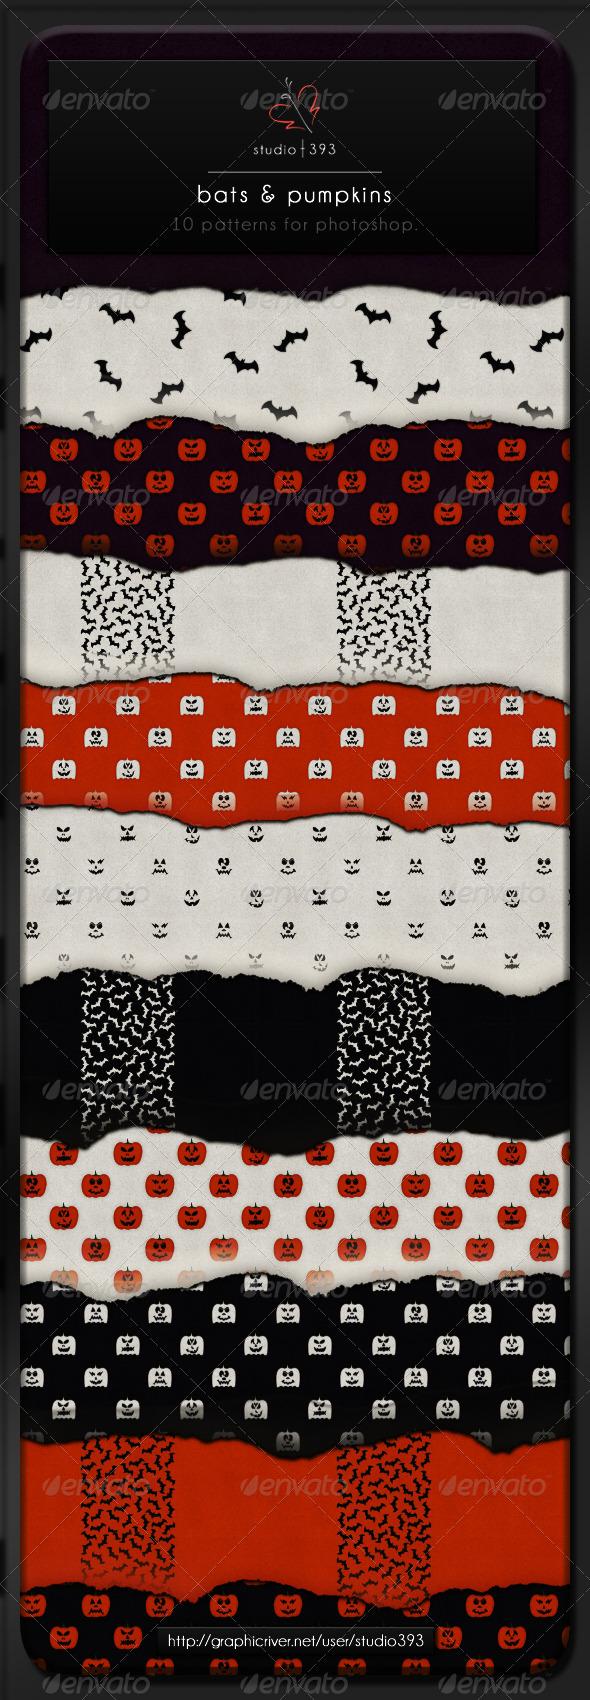 GraphicRiver 10 Bats & Pumpkins Paper Patterns 4377409